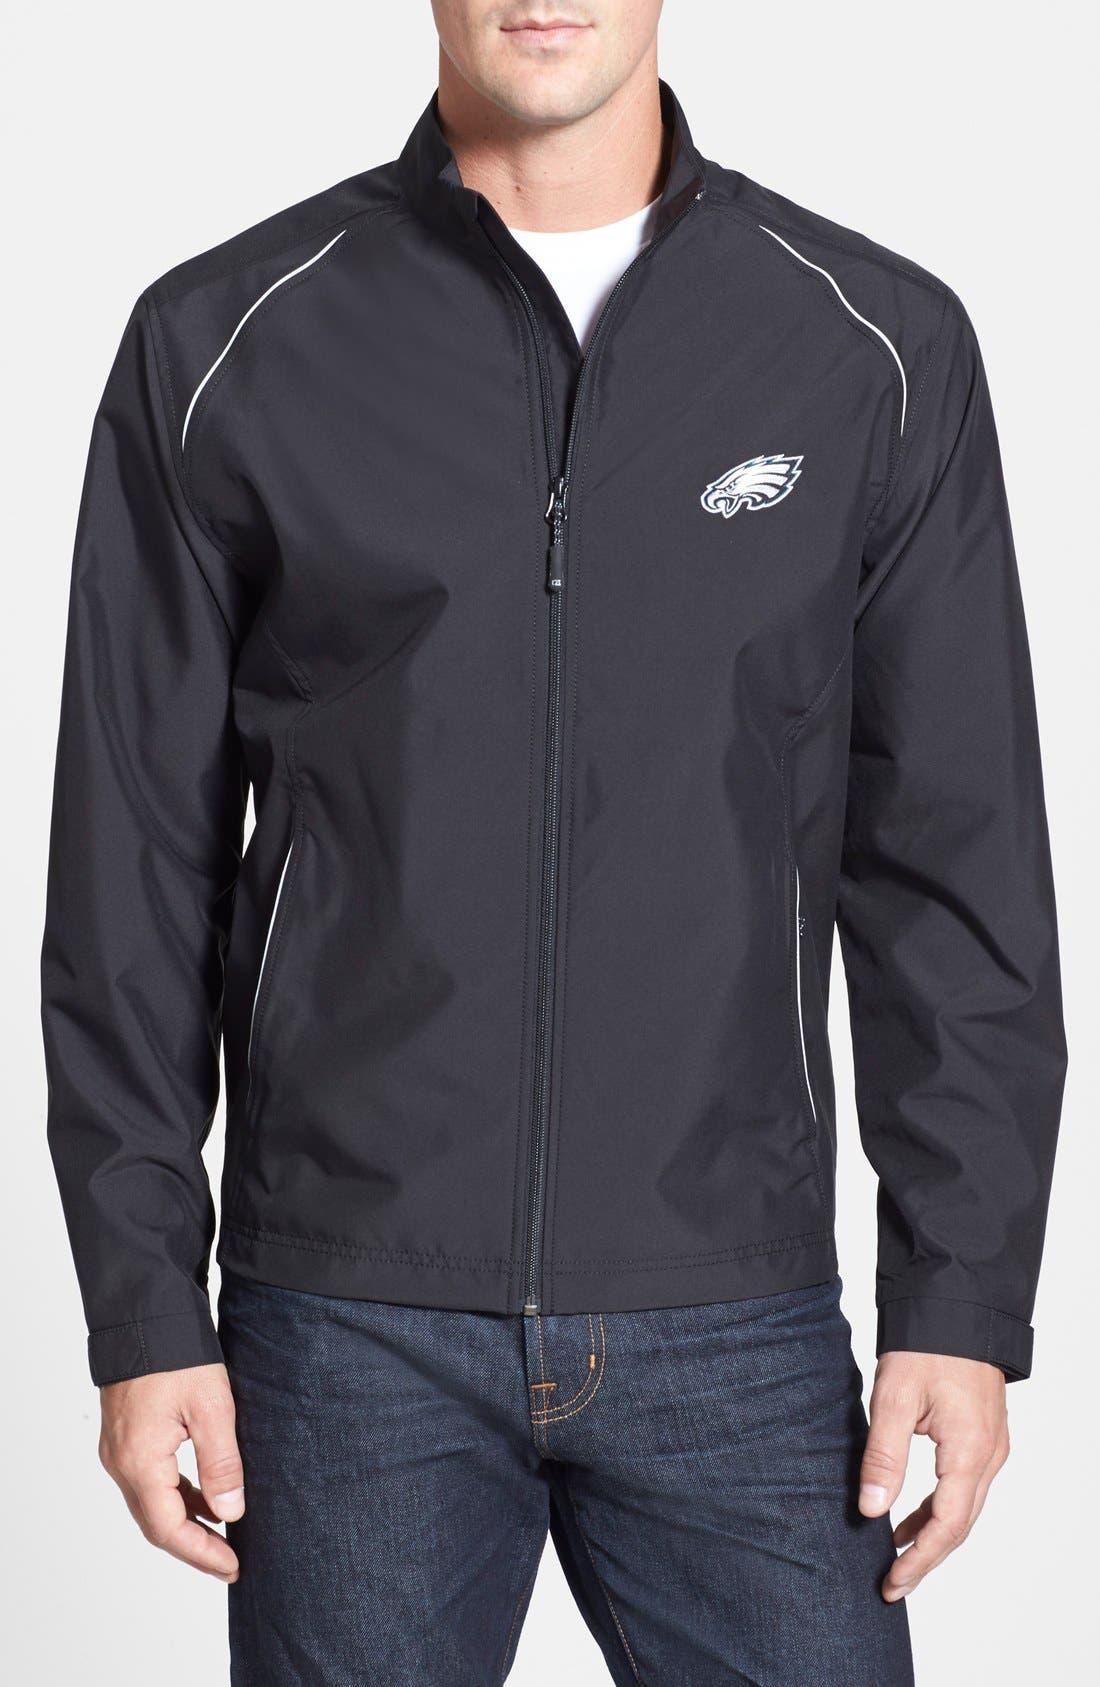 Cutter & Buck Philadelphia Eagles - Beacon WeatherTec Wind & Water Resistant Jacket